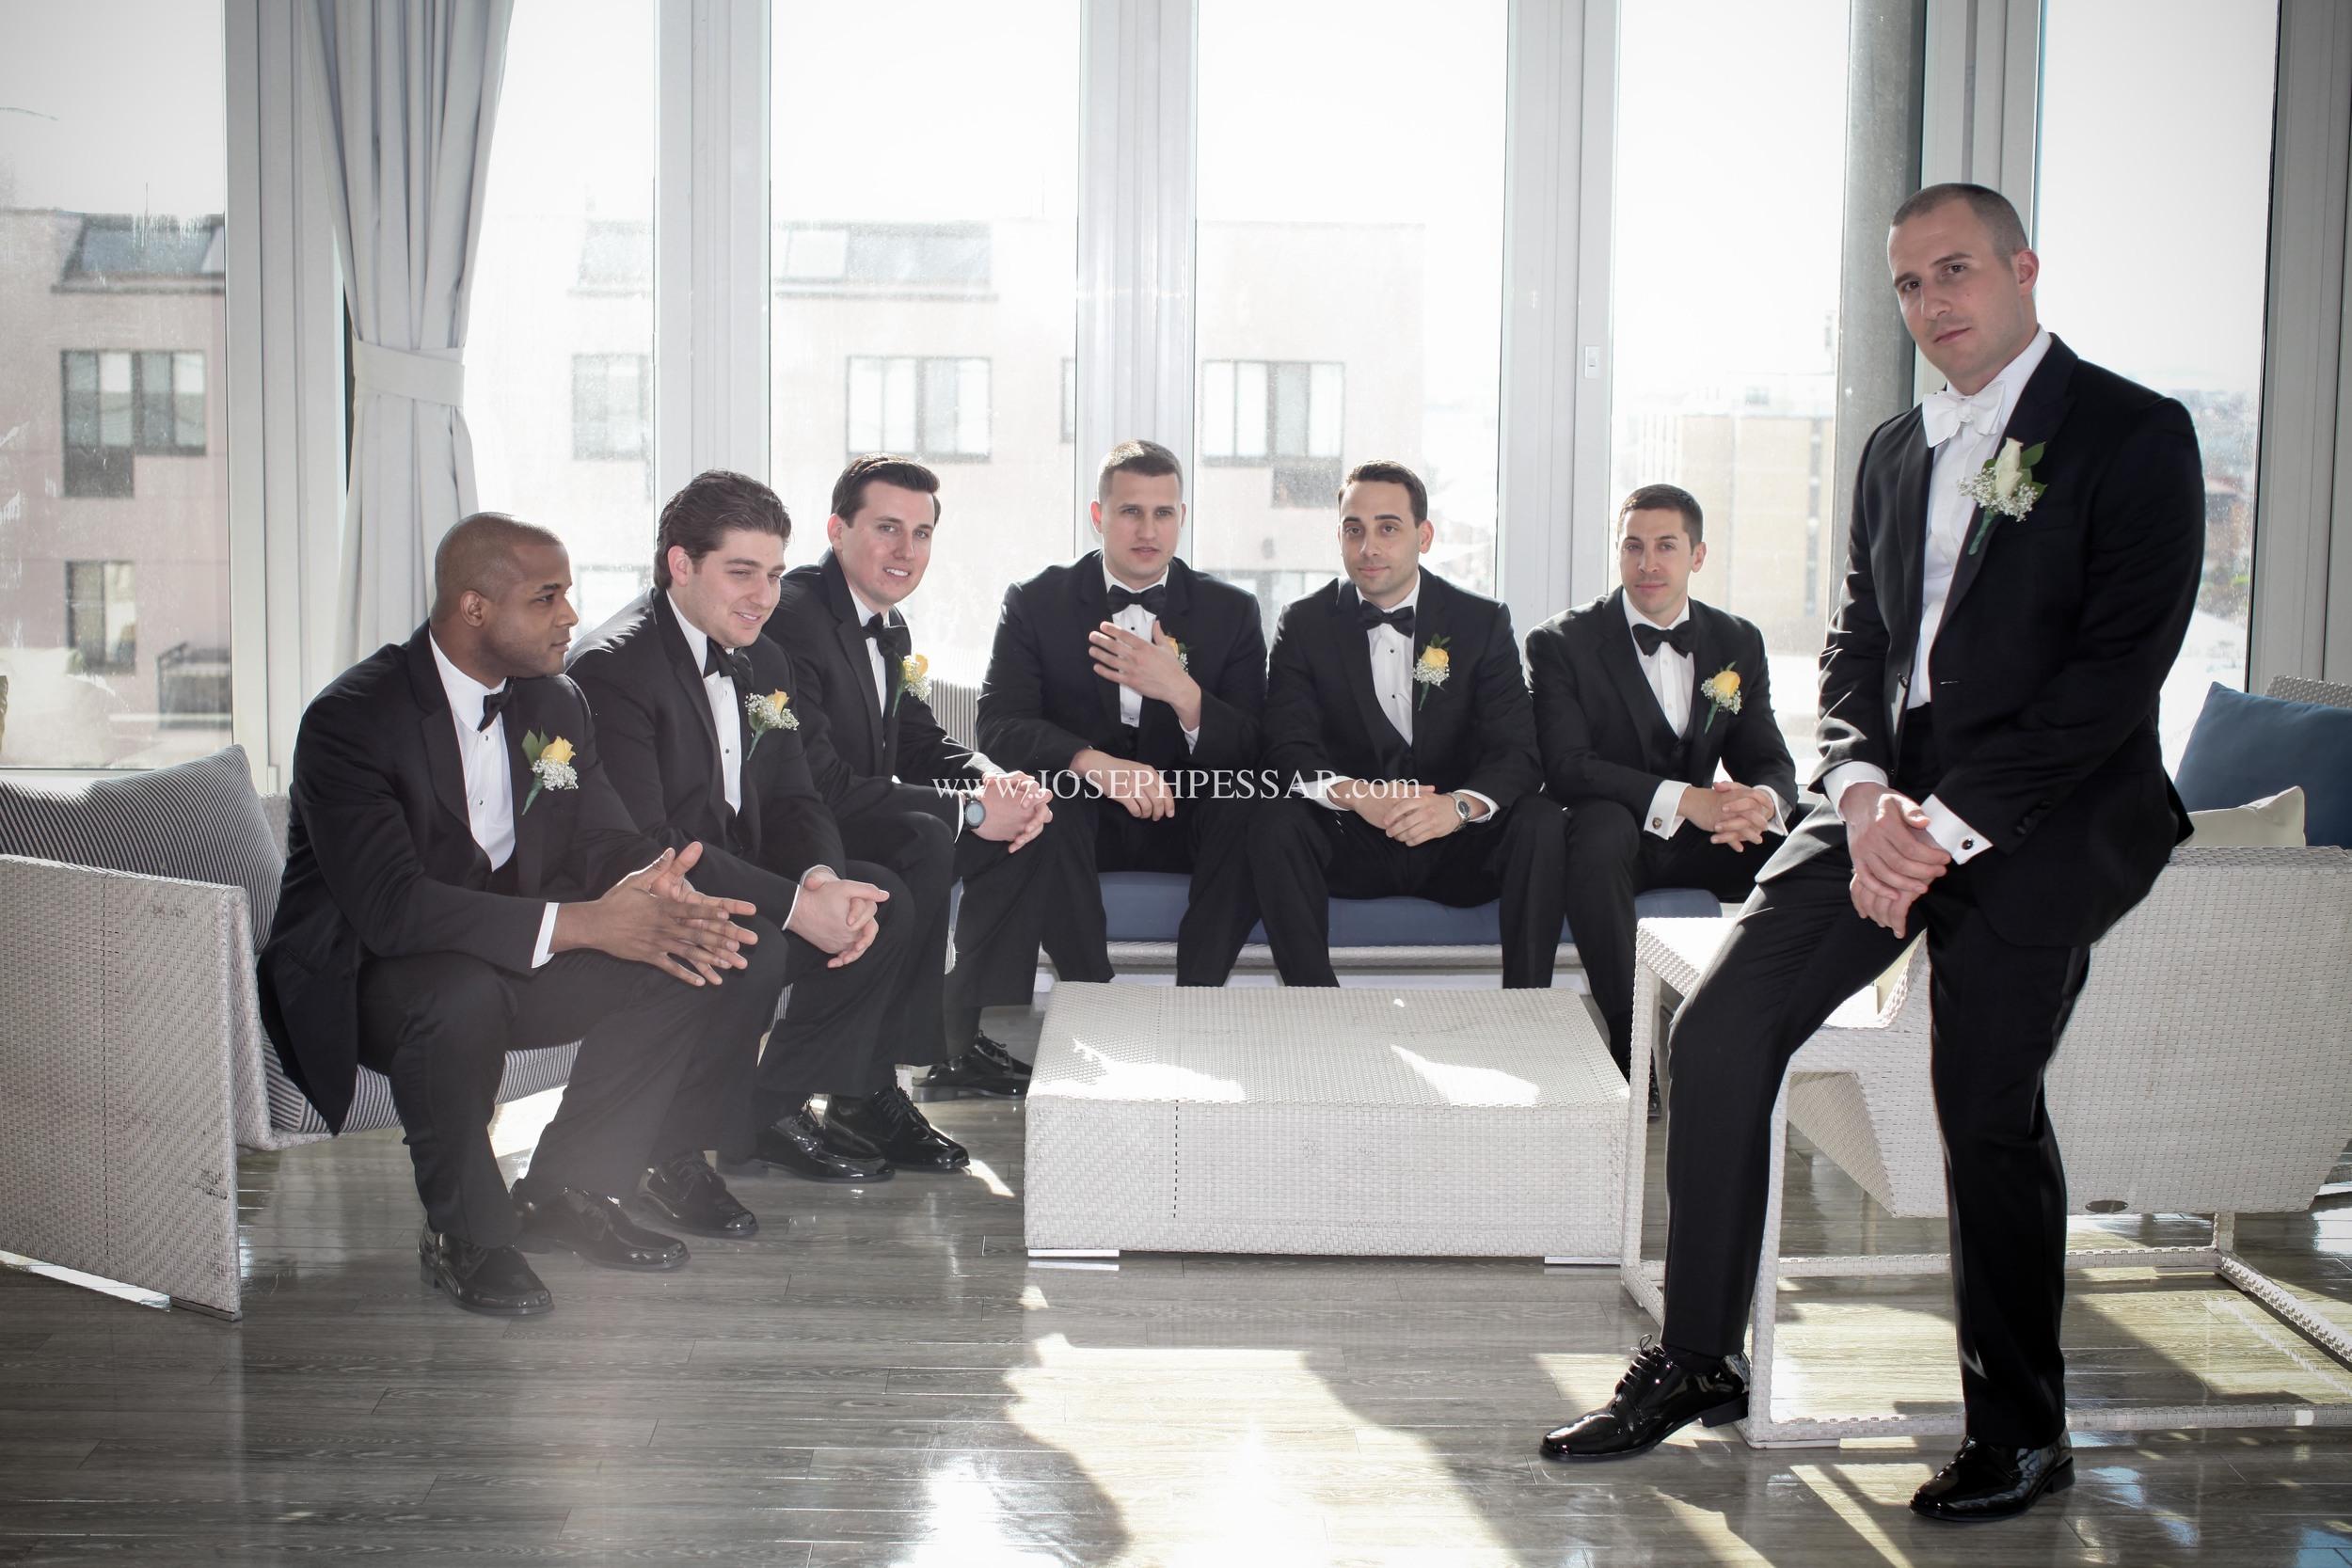 nyc_wedding_photographer0030.jpg